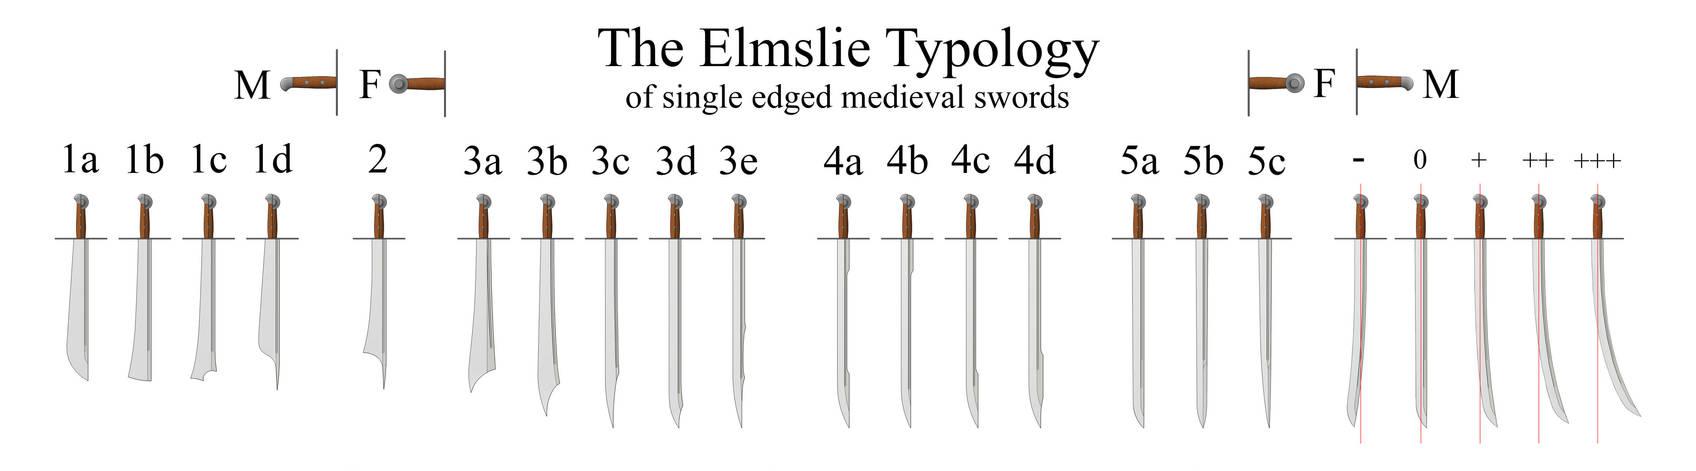 Elmslie Typology of single edged medieval swords by shad-brooks